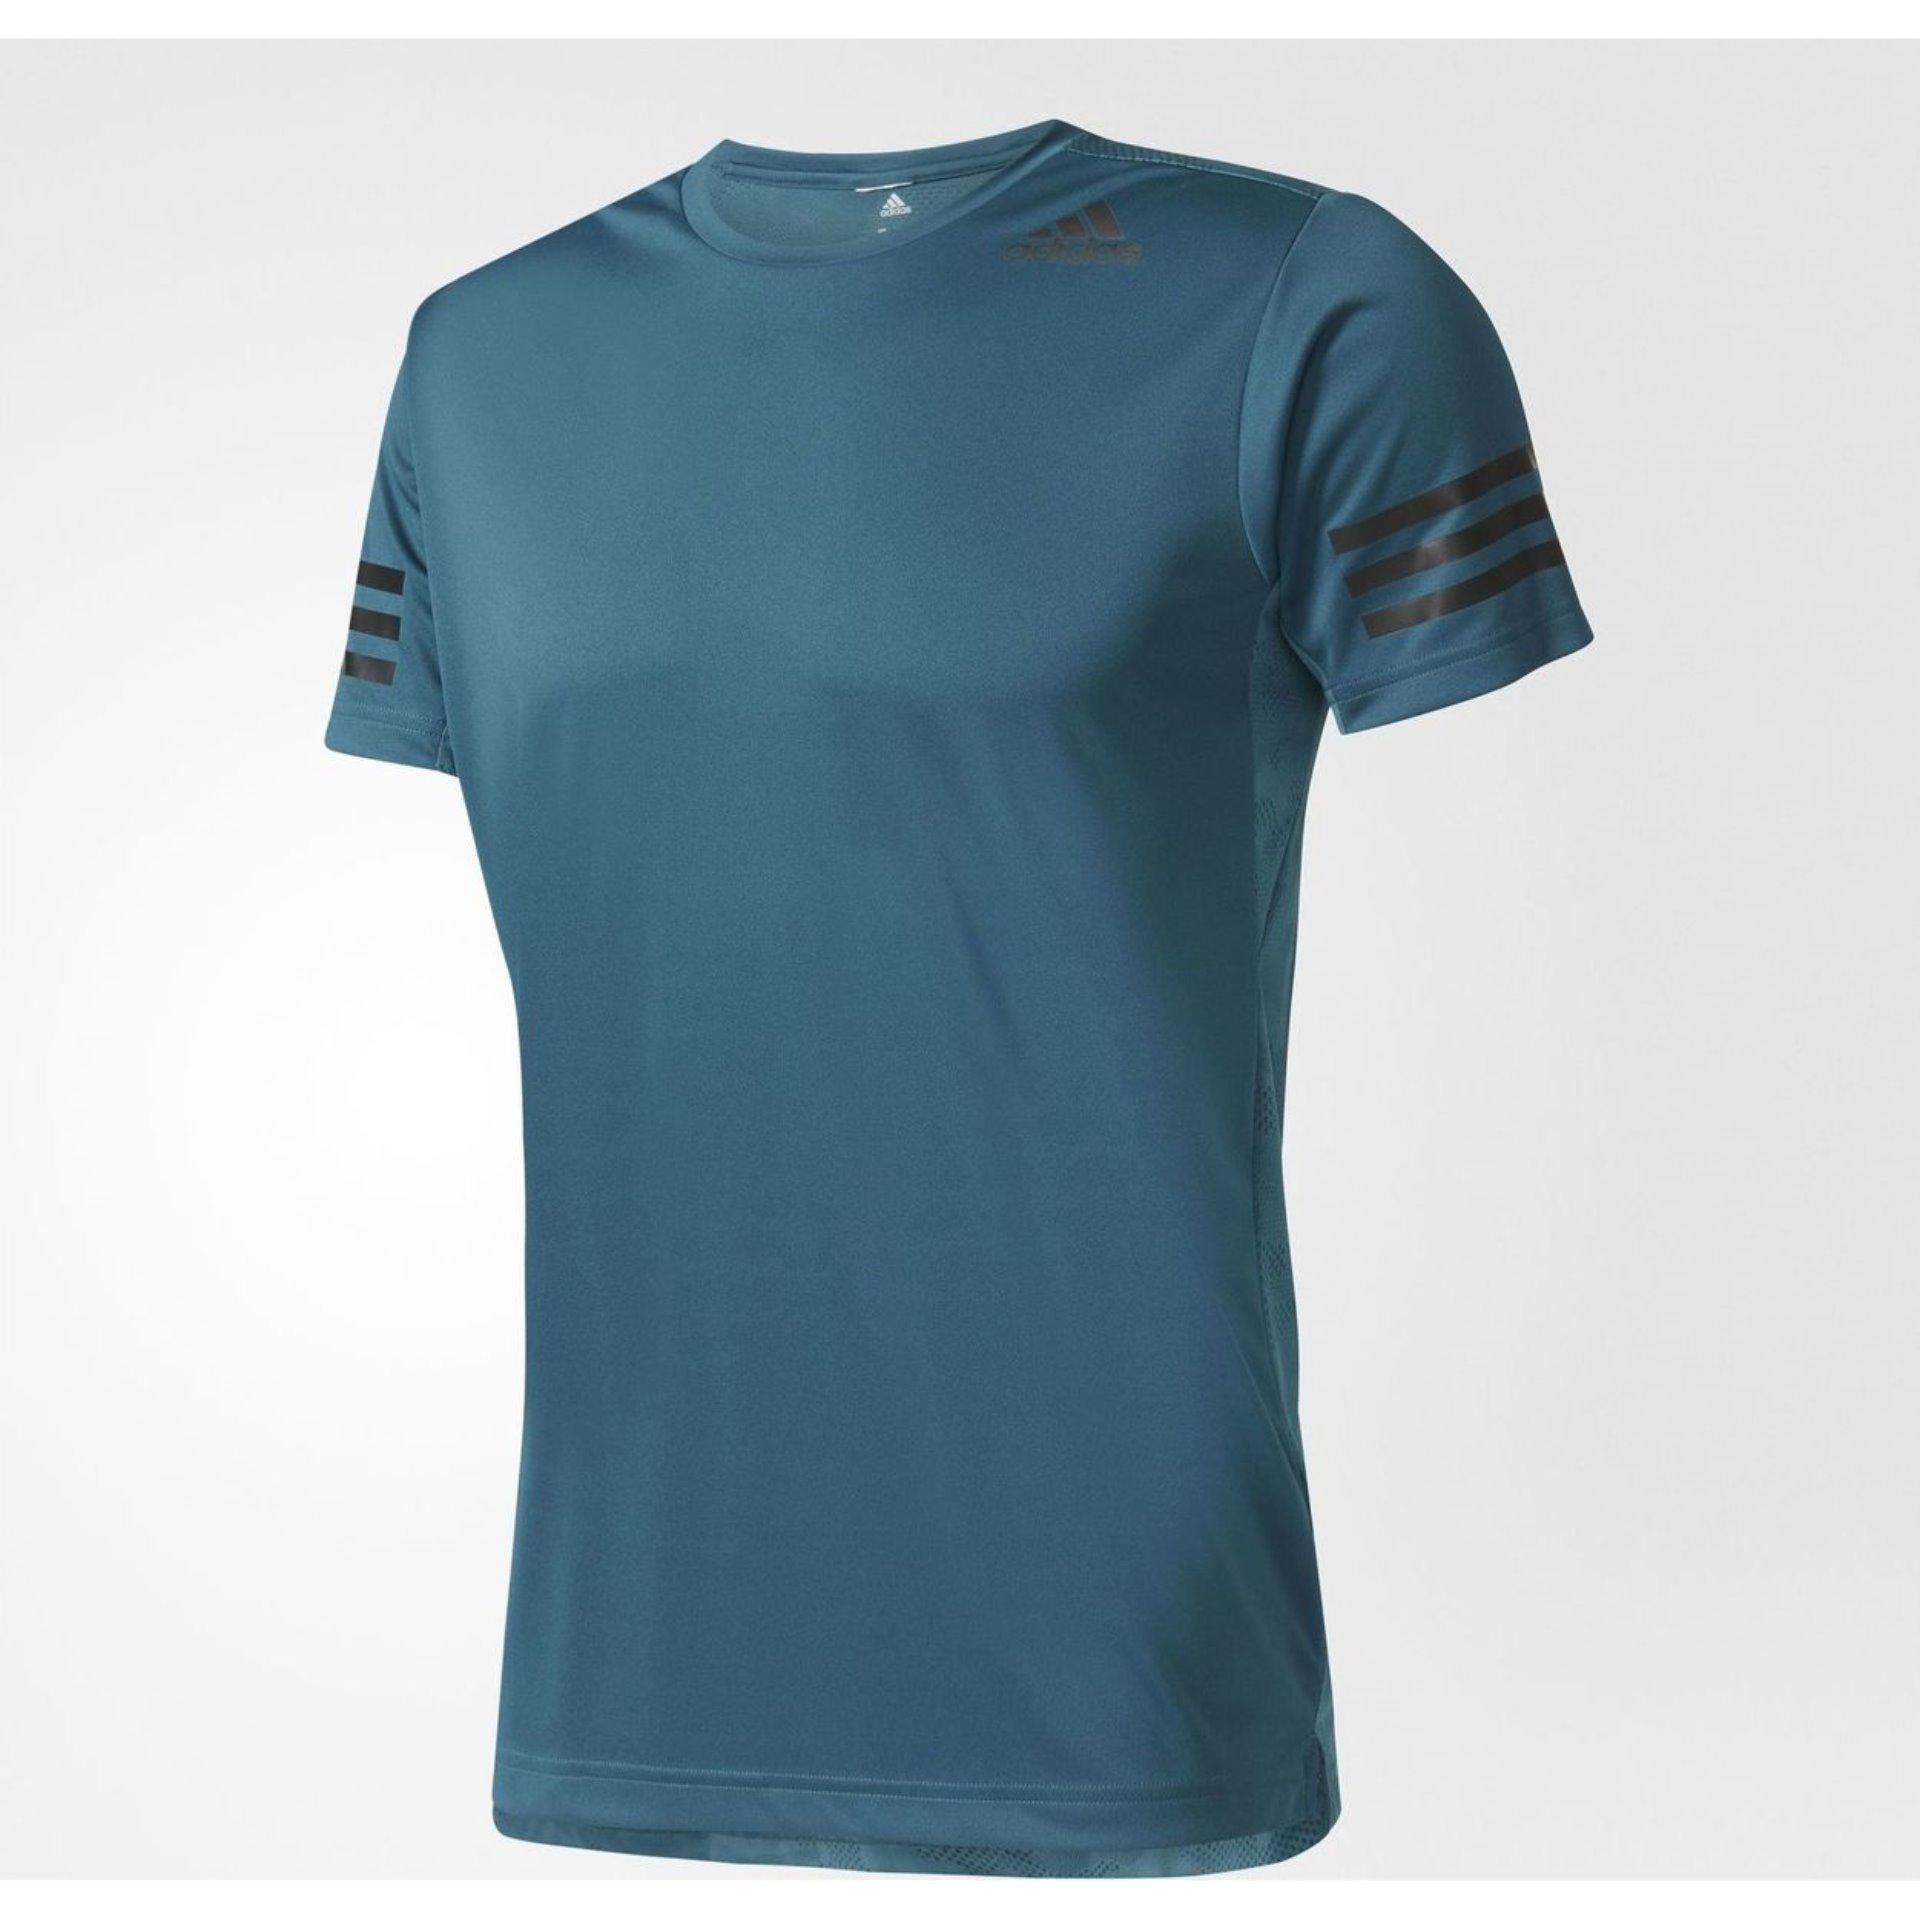 Katalog Adidas Kaos Freelift Climacool Tee Bk6125 Adidas Terbaru